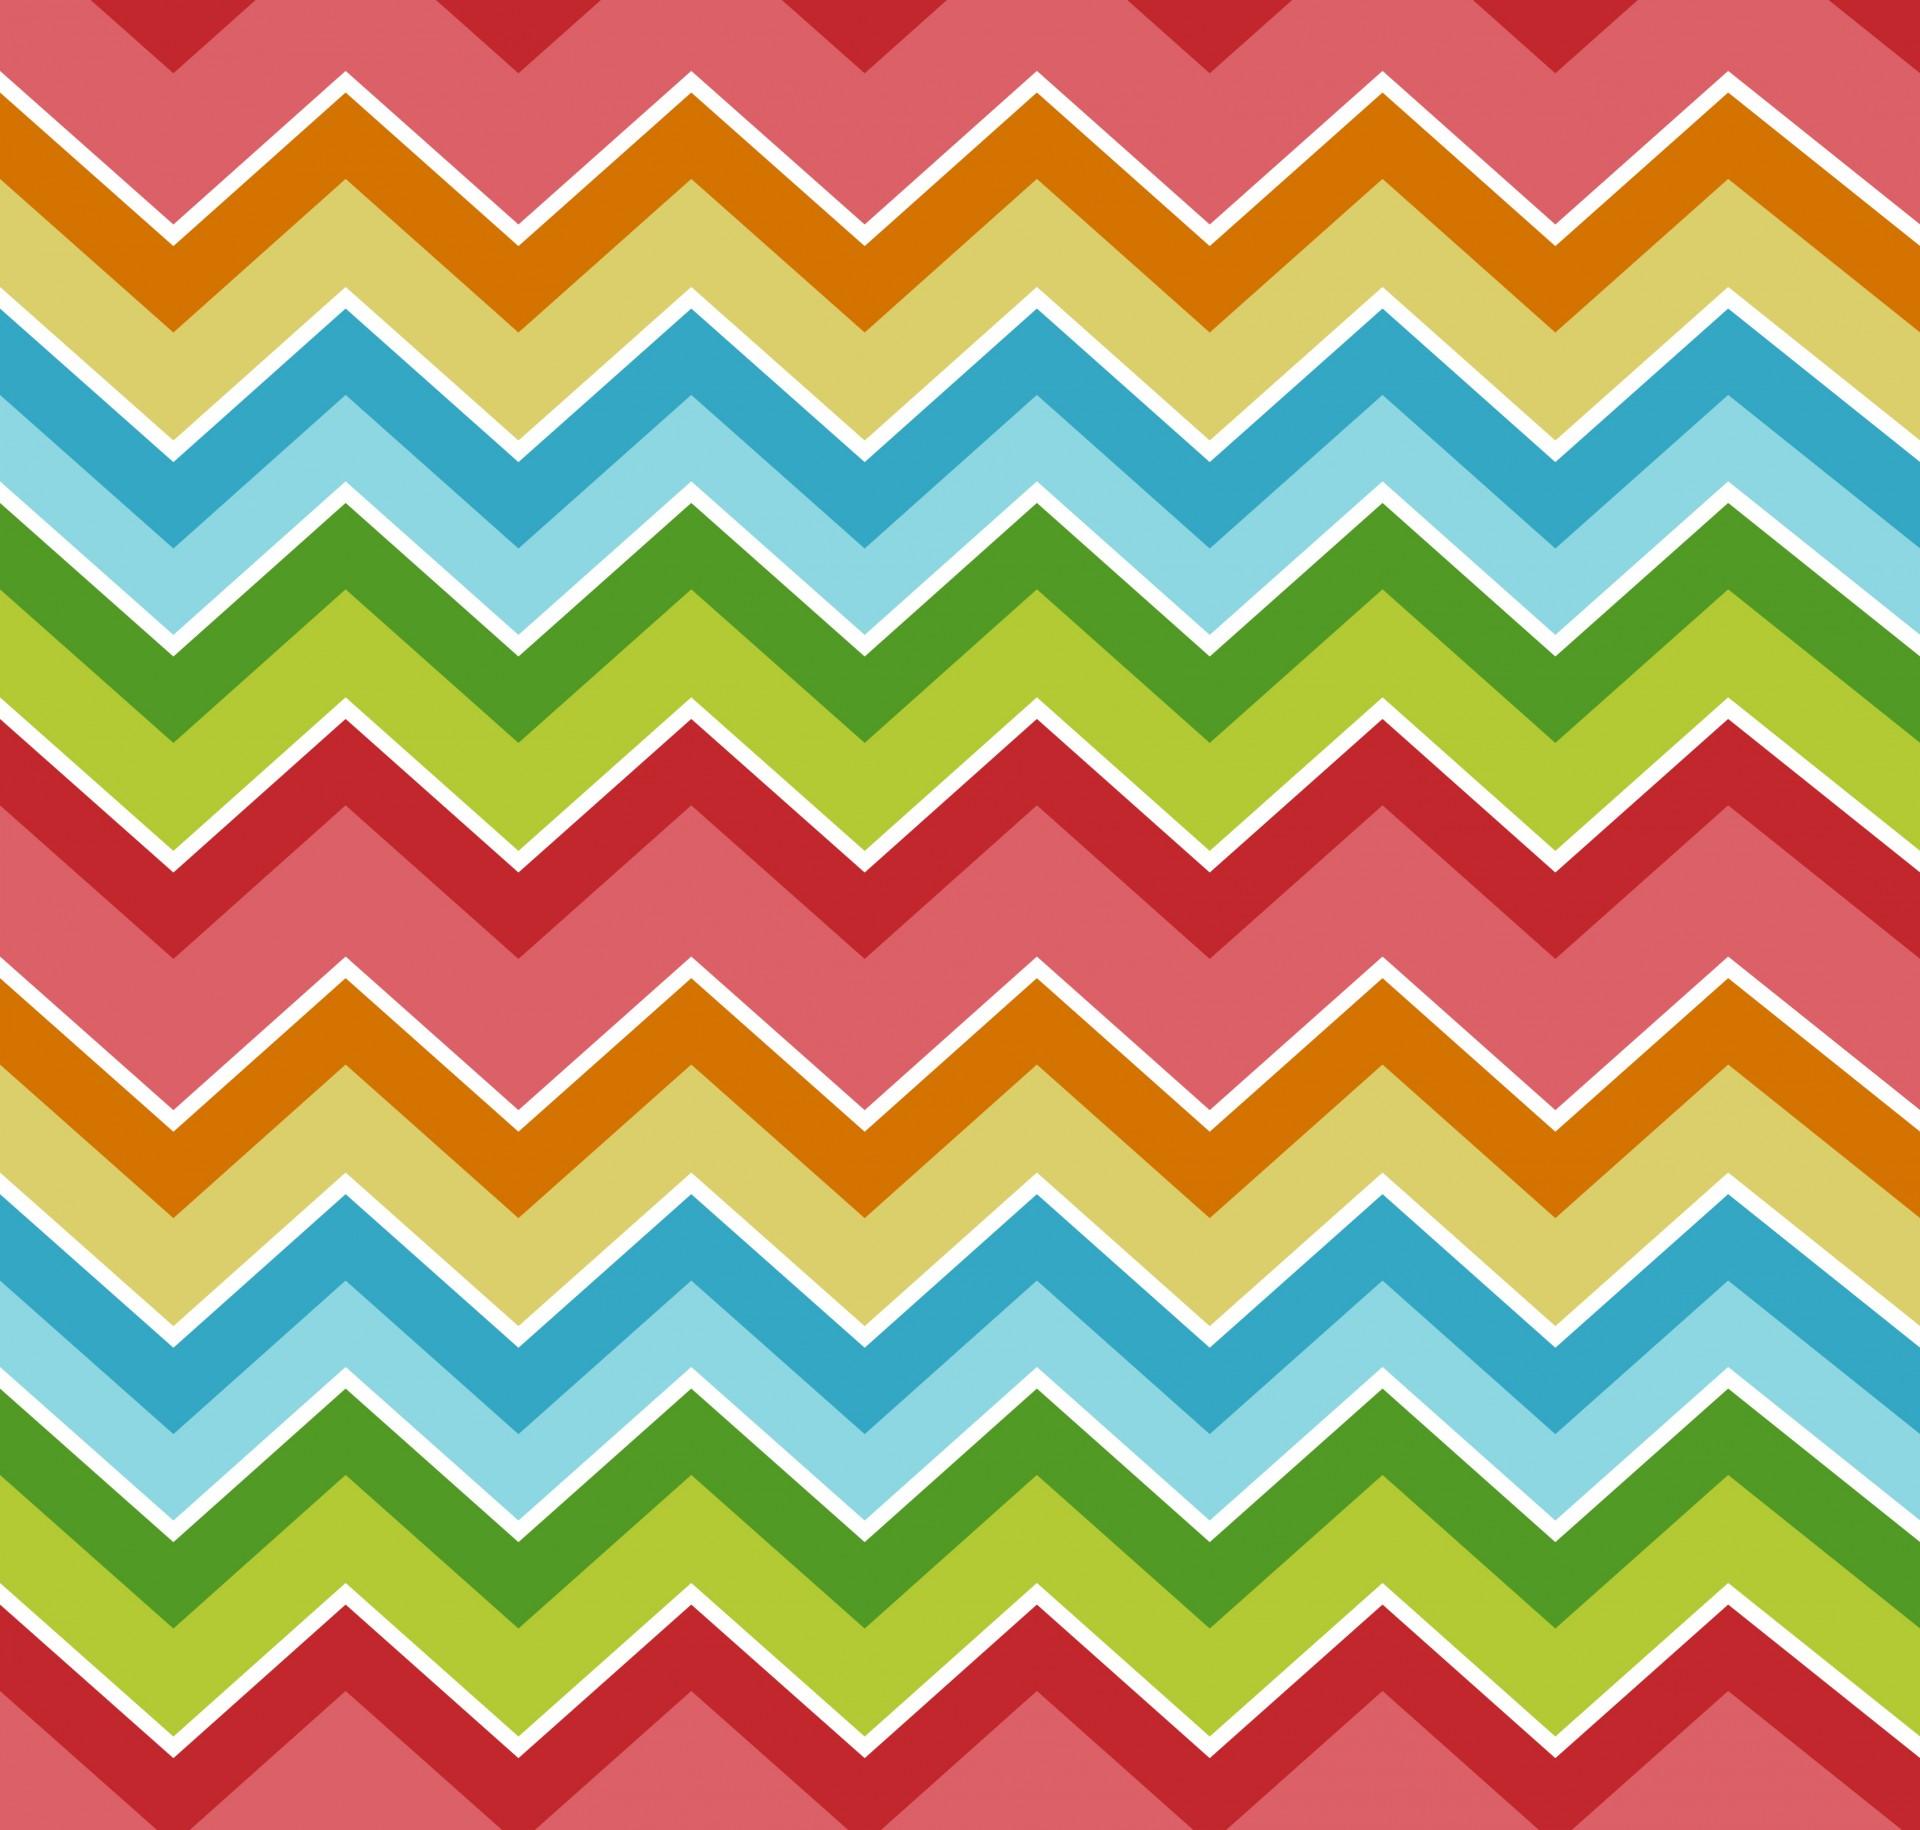 Chevrons Zigzag Colorful Background Free Stock Photo